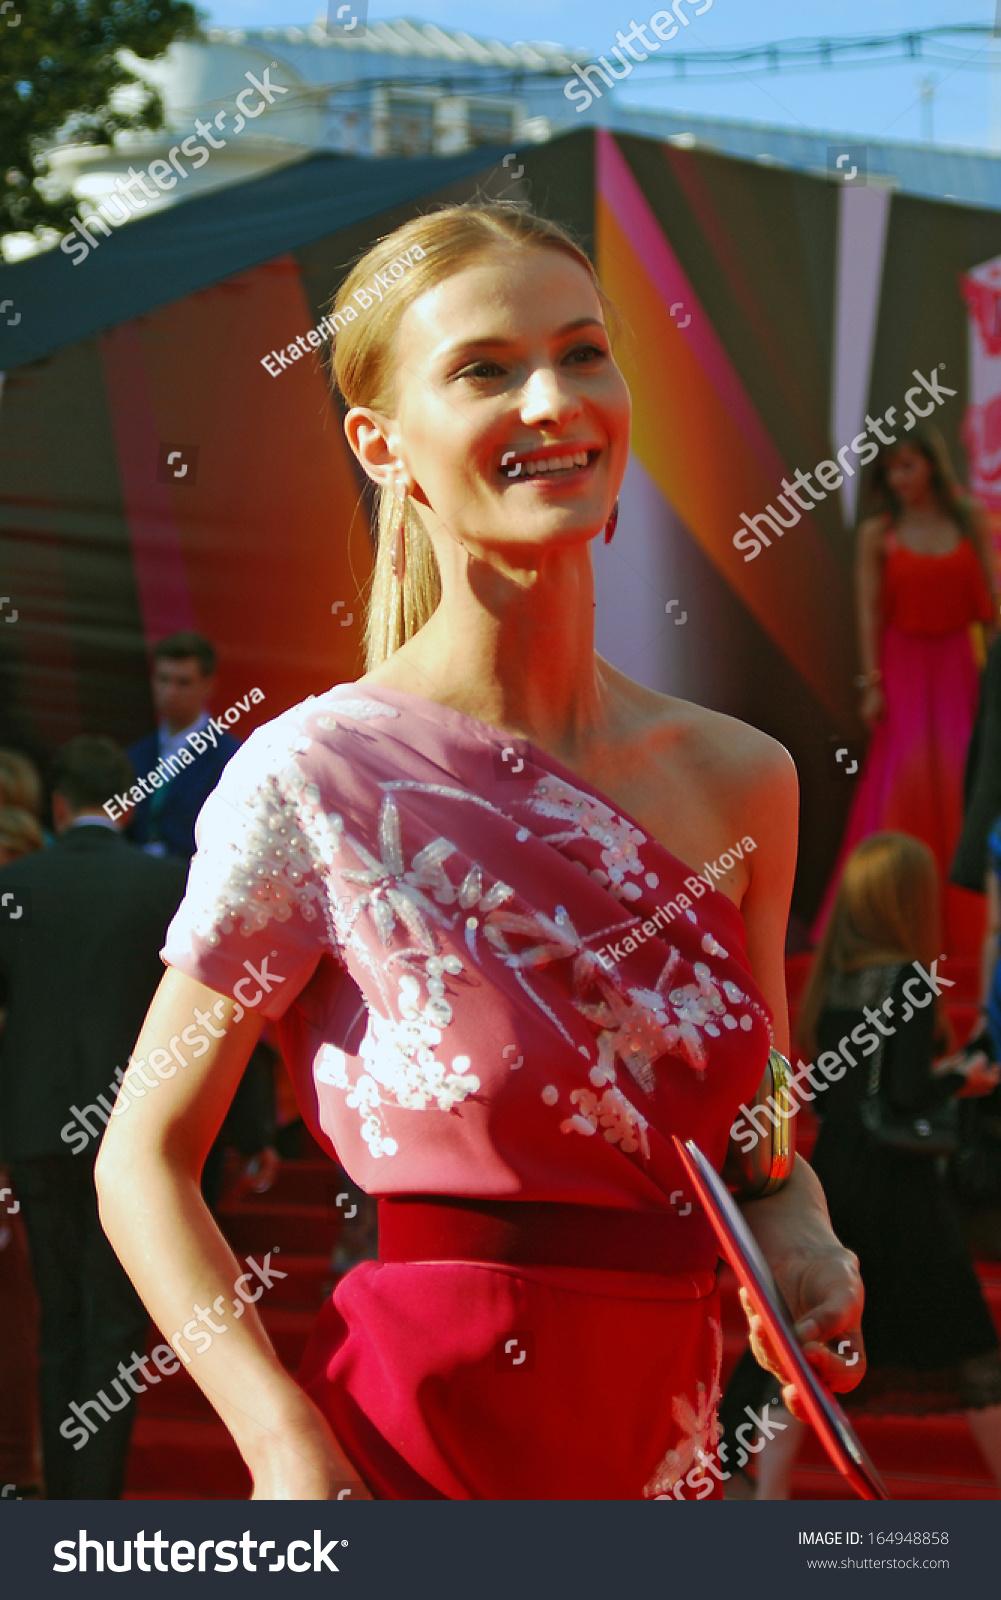 Young Svetlana Ivanova nude photos 2019